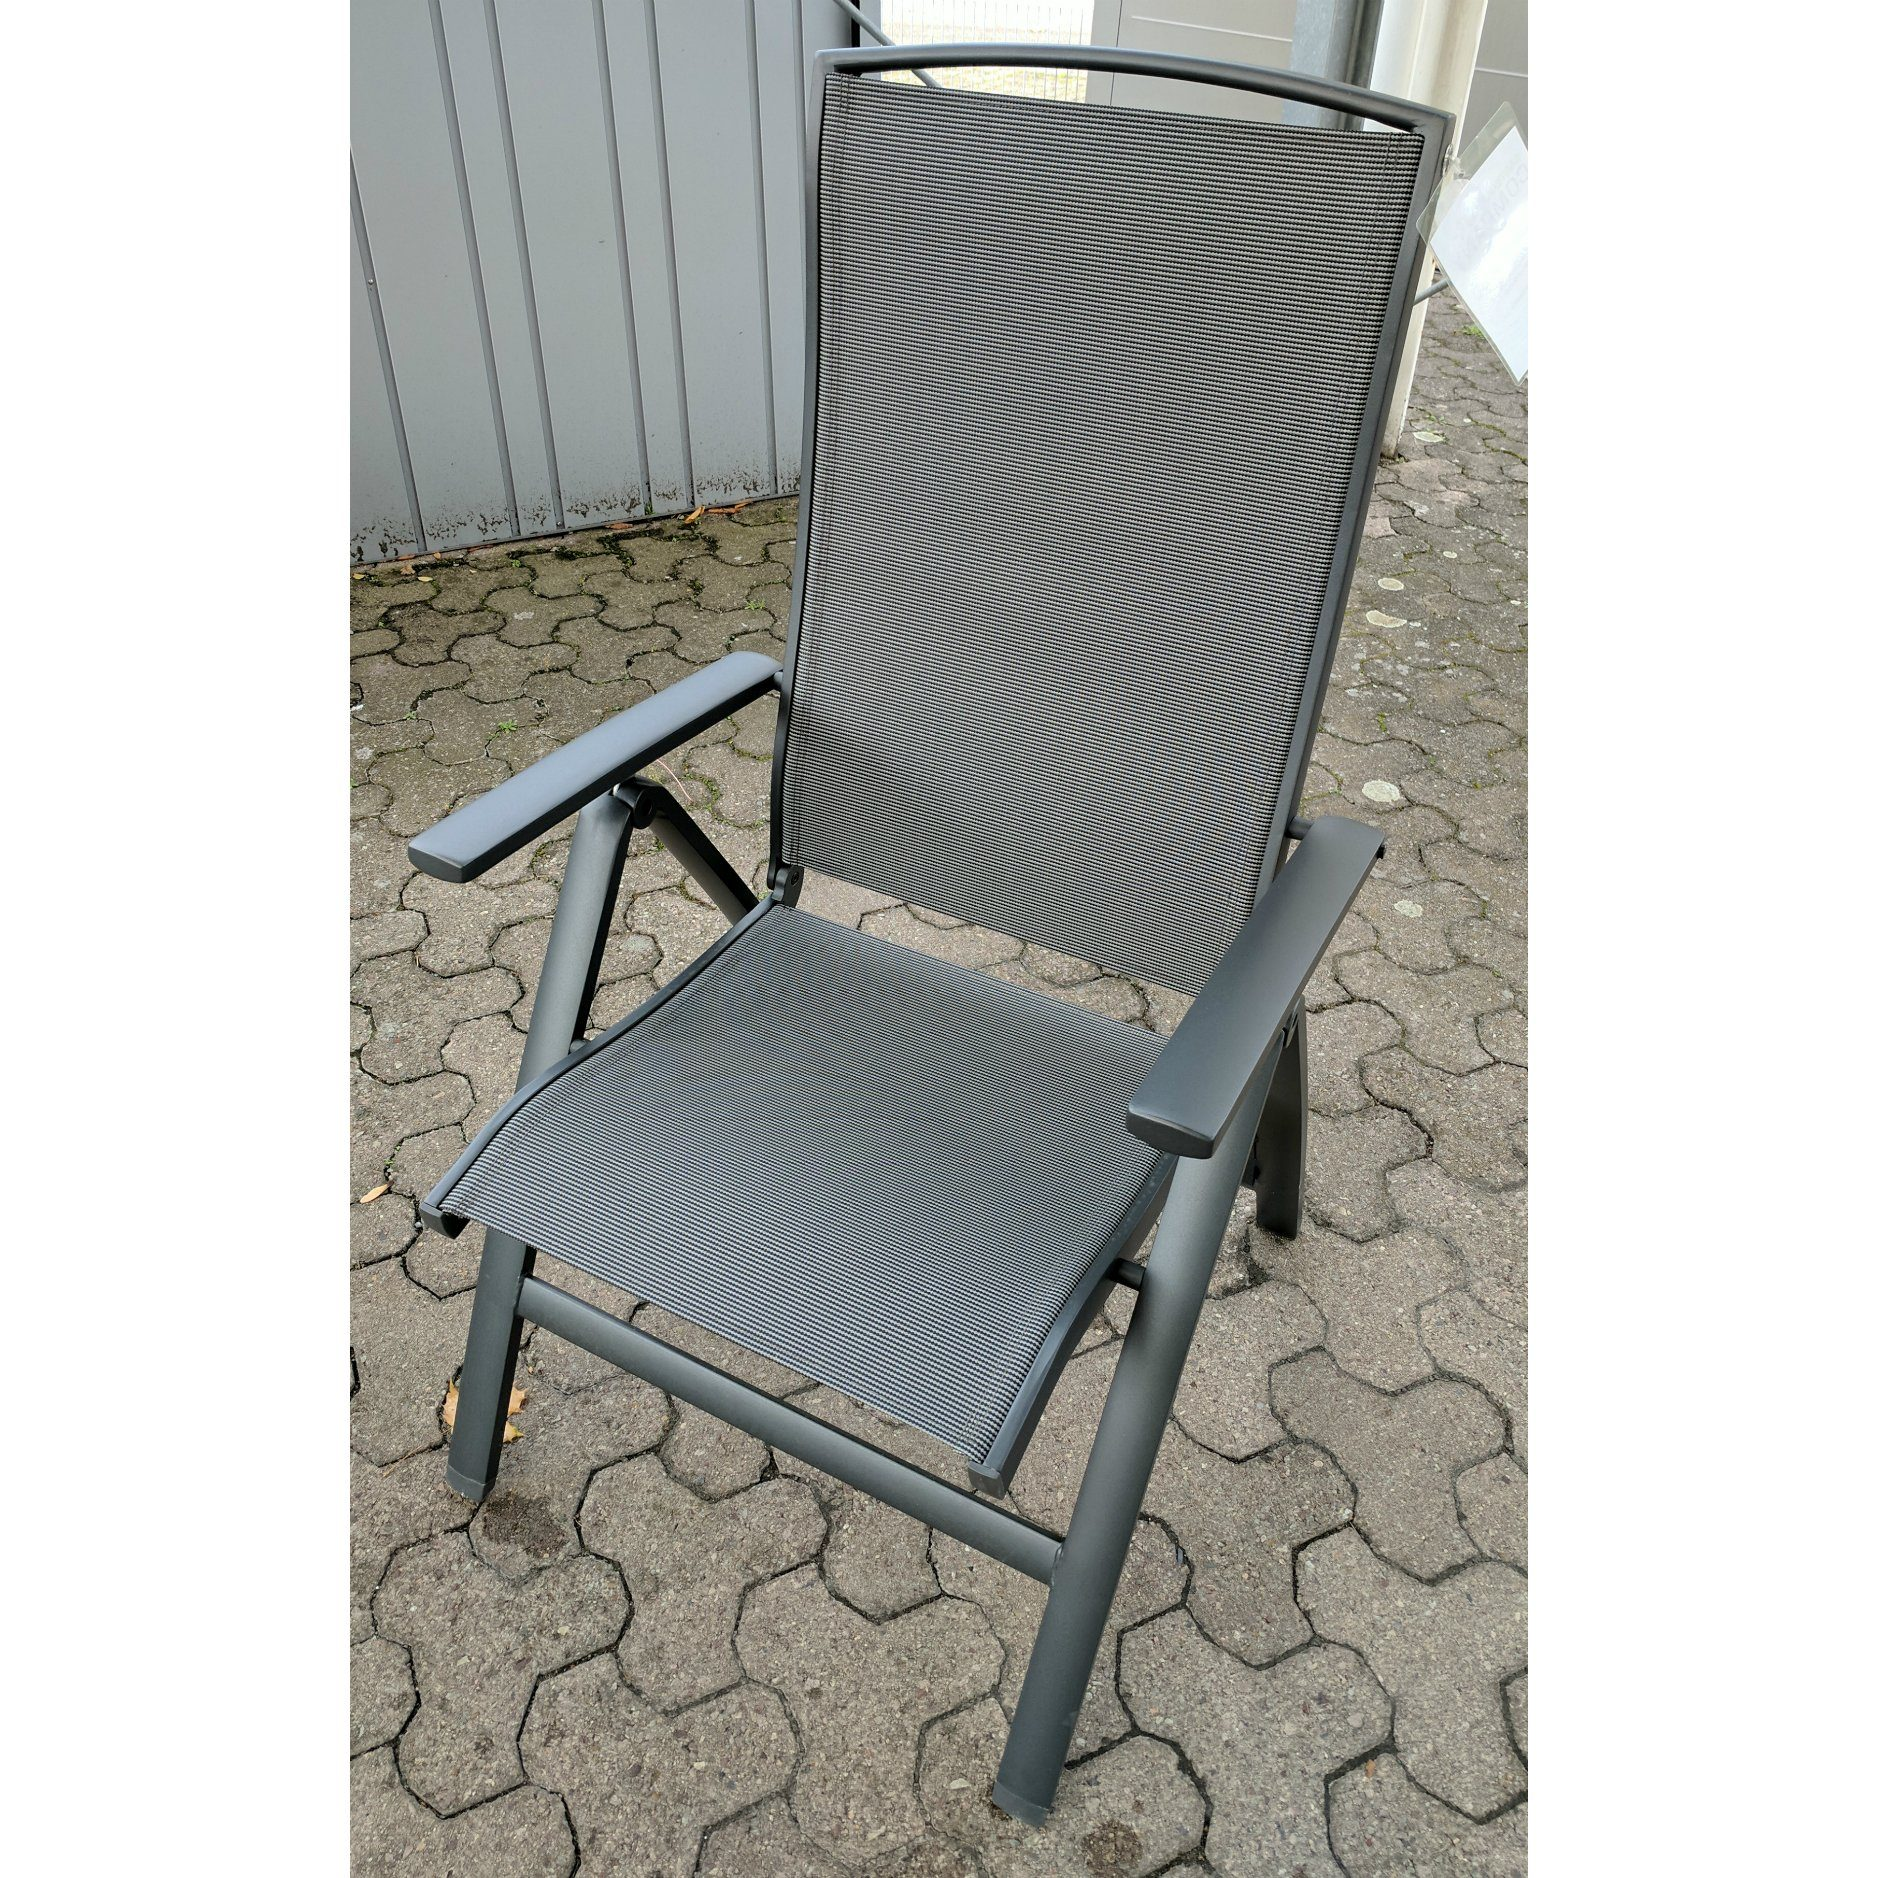 "Kollektion K ""Caledon"" Gartenstuhl, Gestell Aluminium eisengrau, Sitz- und Rückenfläche Textilgewebe silbergrau"